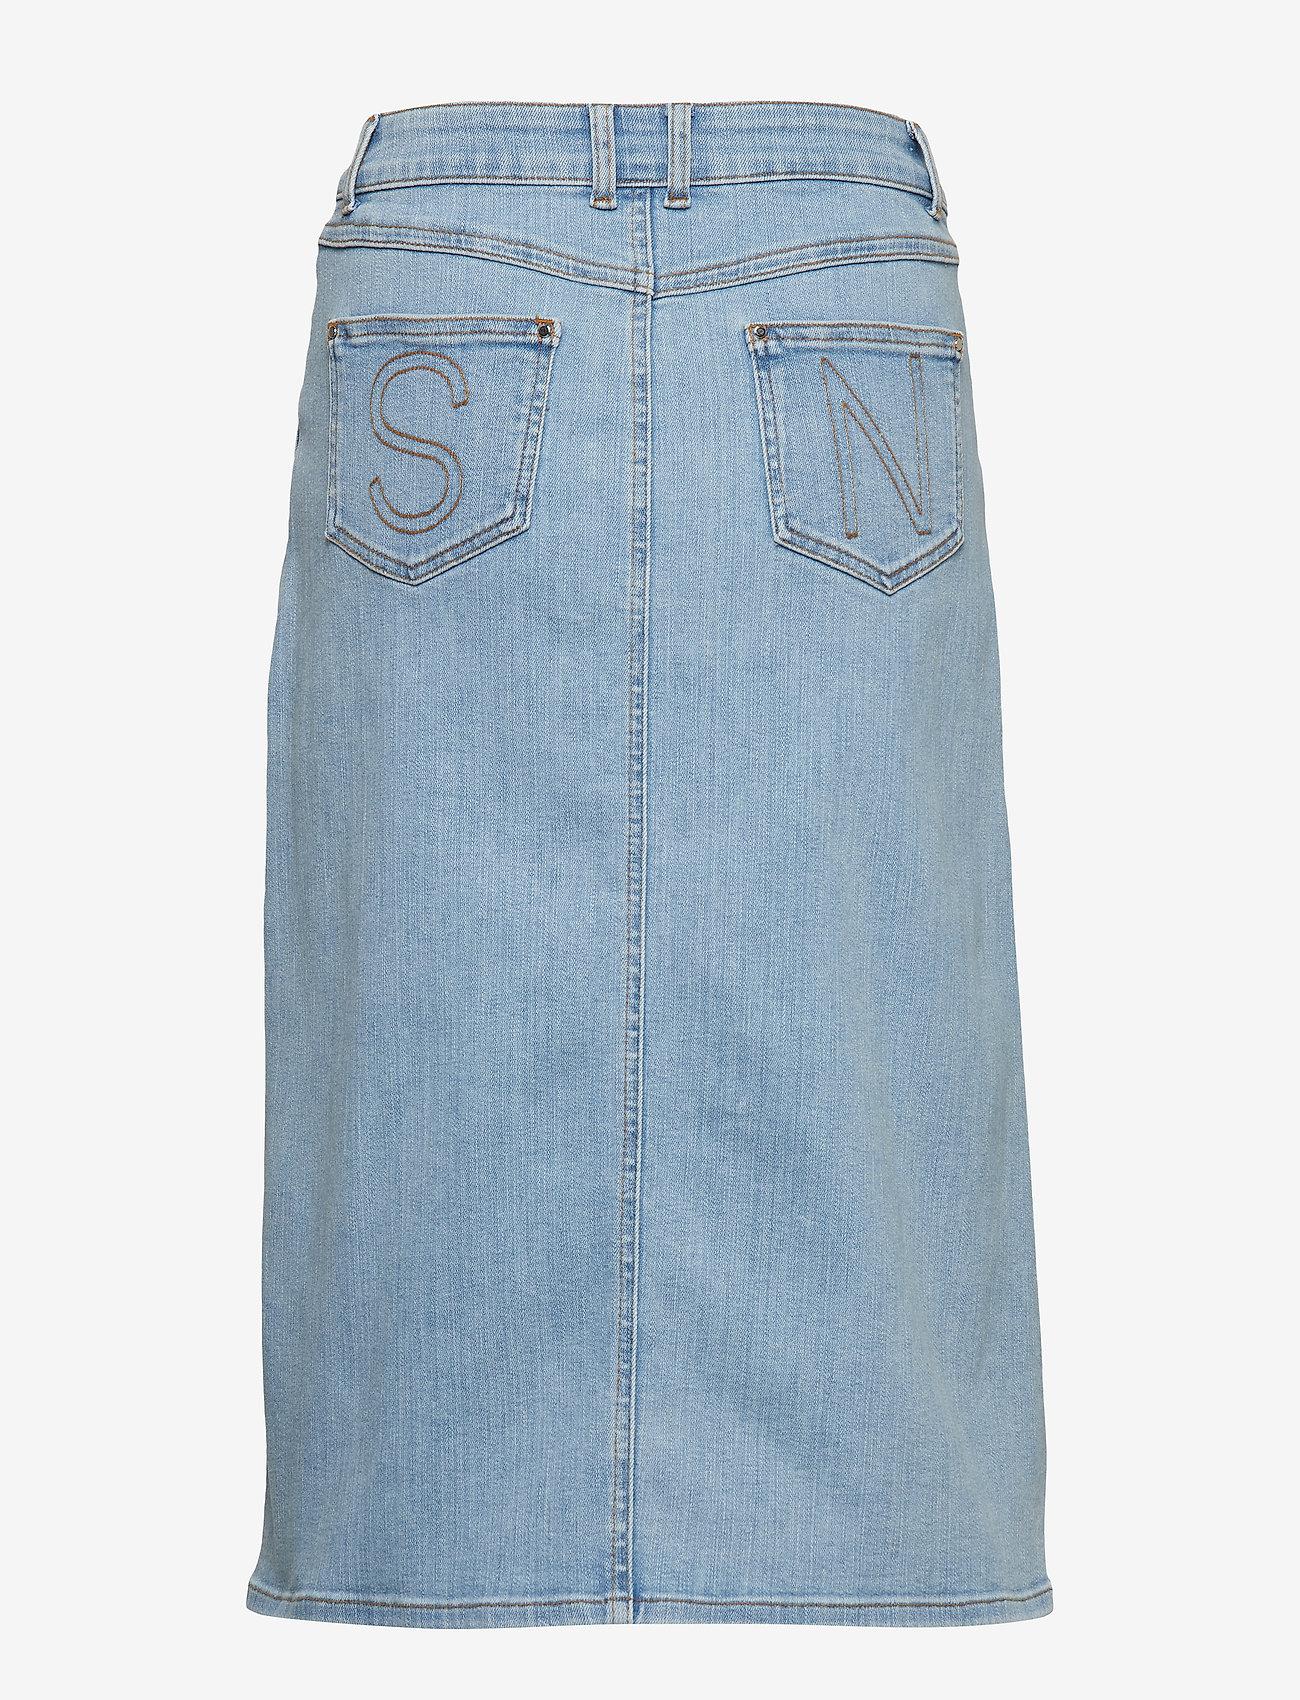 Stella Nova Wenya - Skirts SOLITUDE BLUE